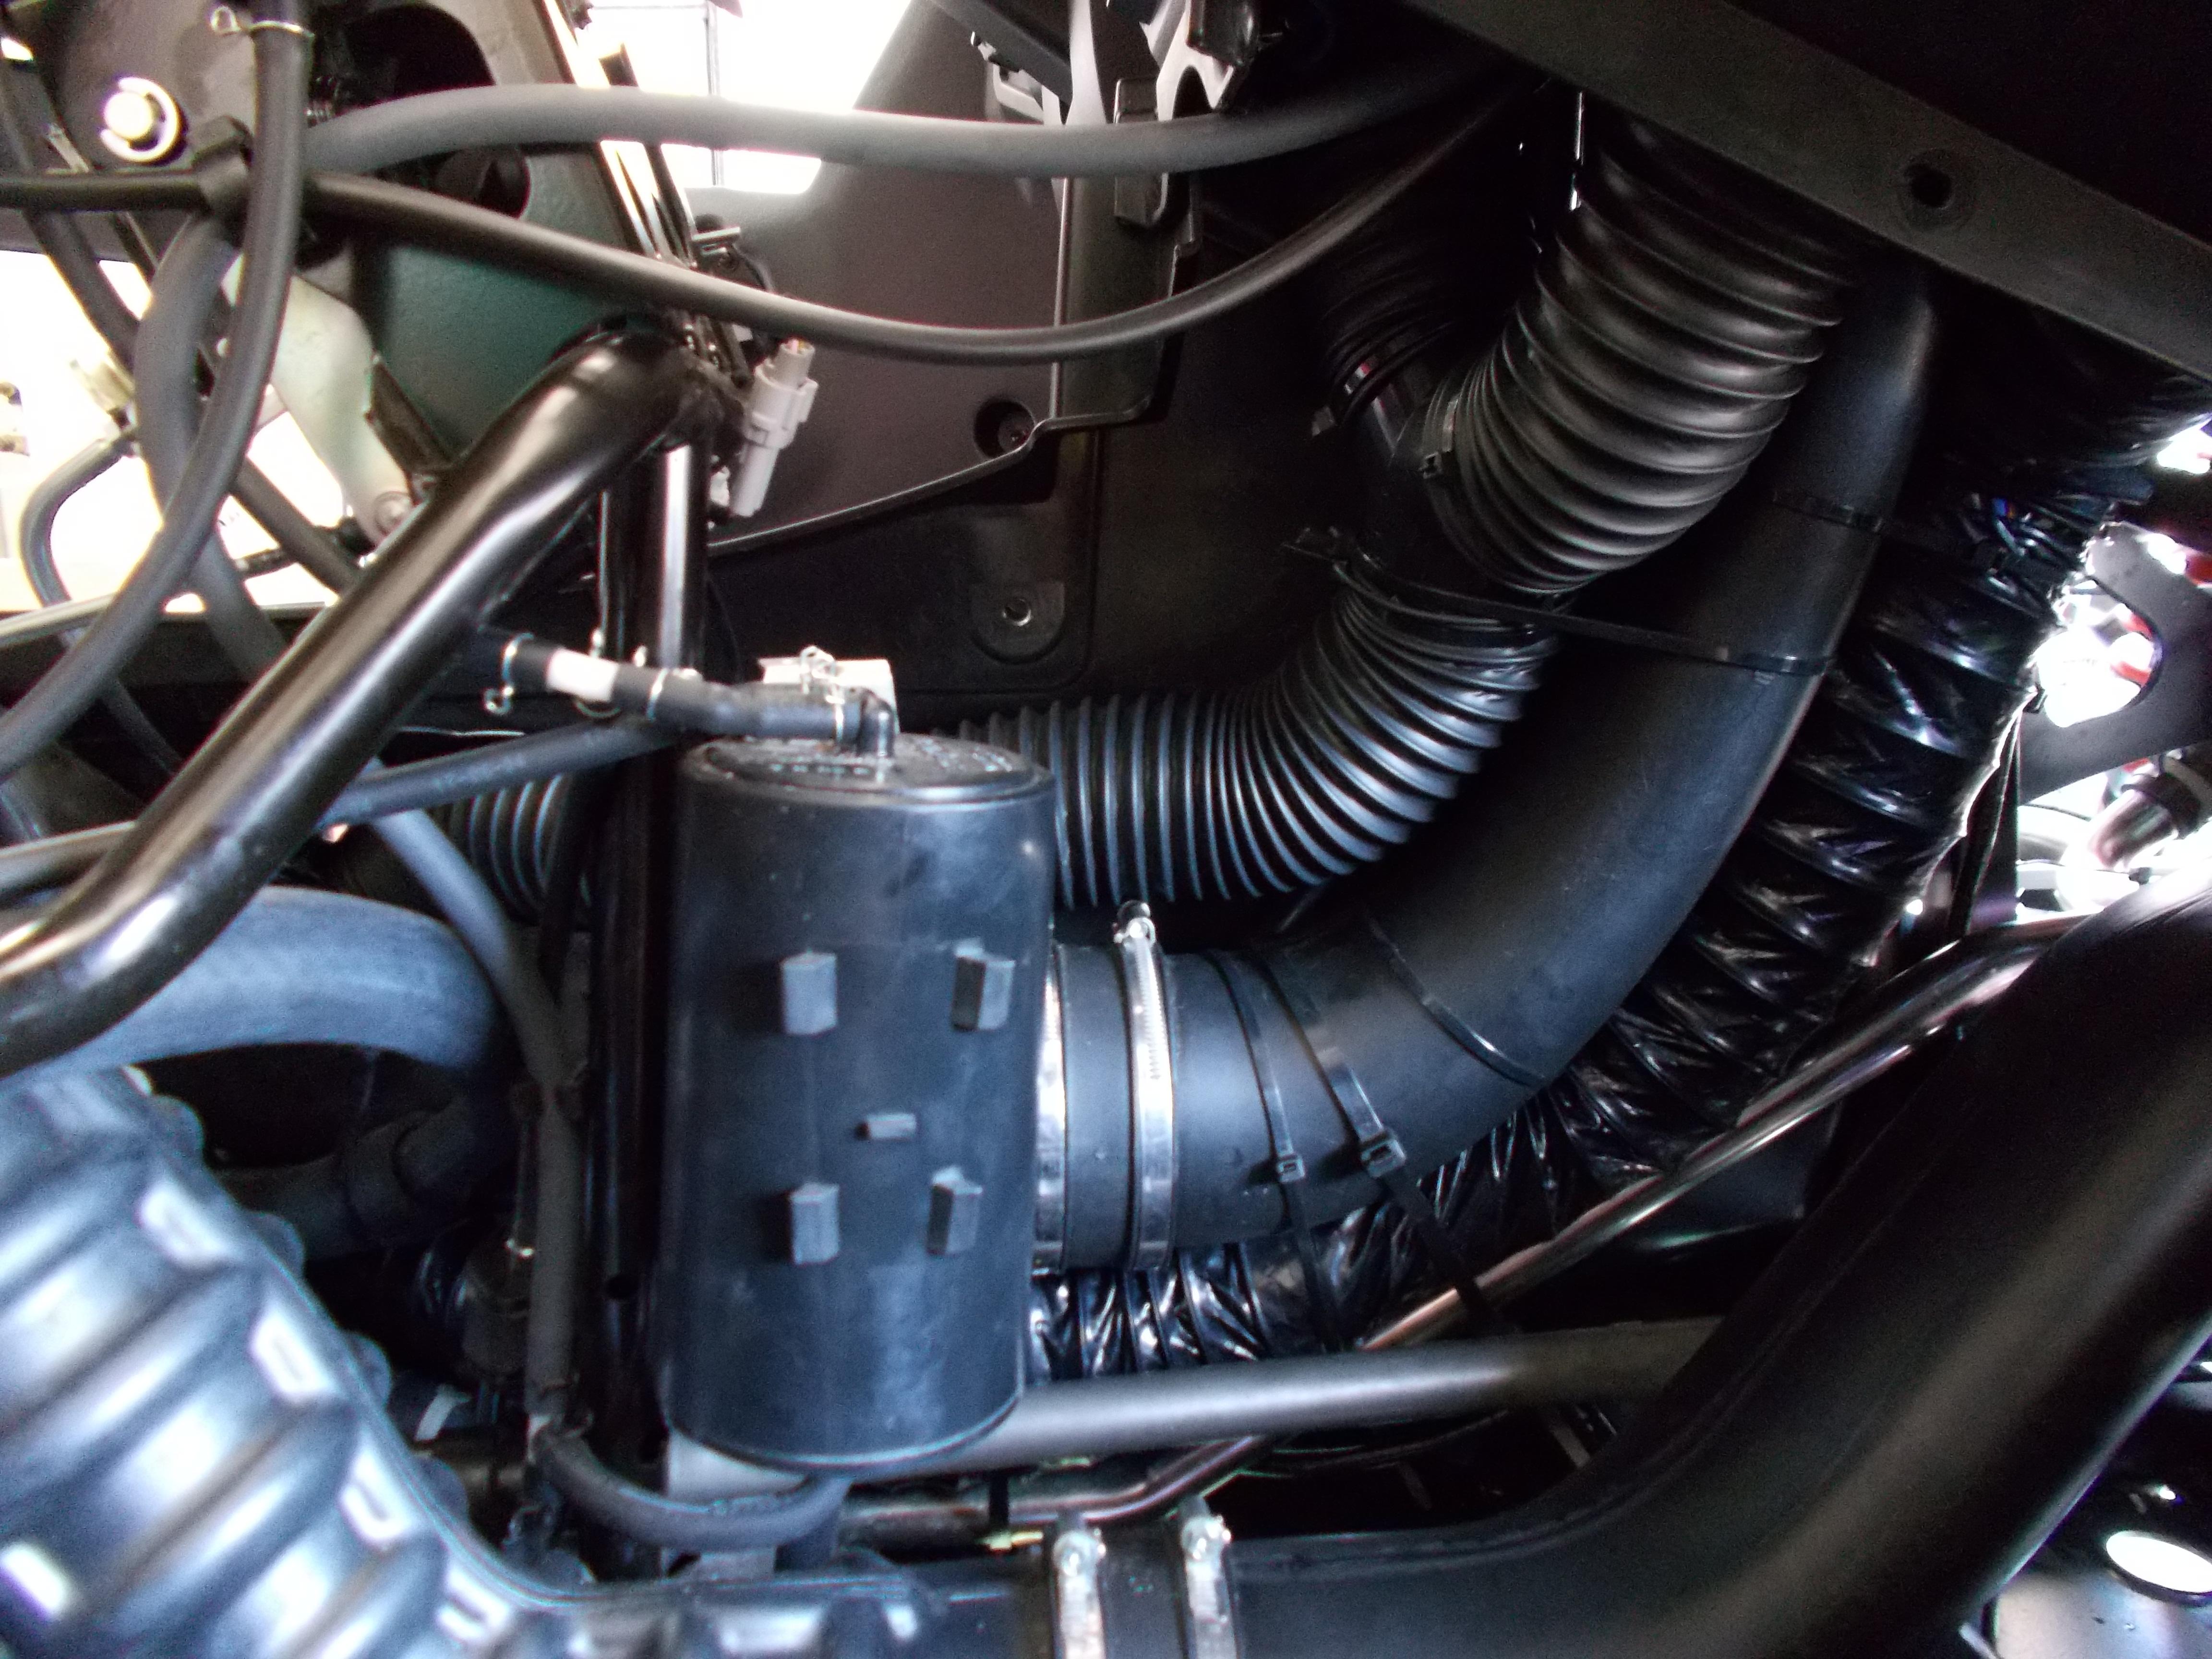 Summit Heater Installed In The Wolverine X4 Toasty Ride